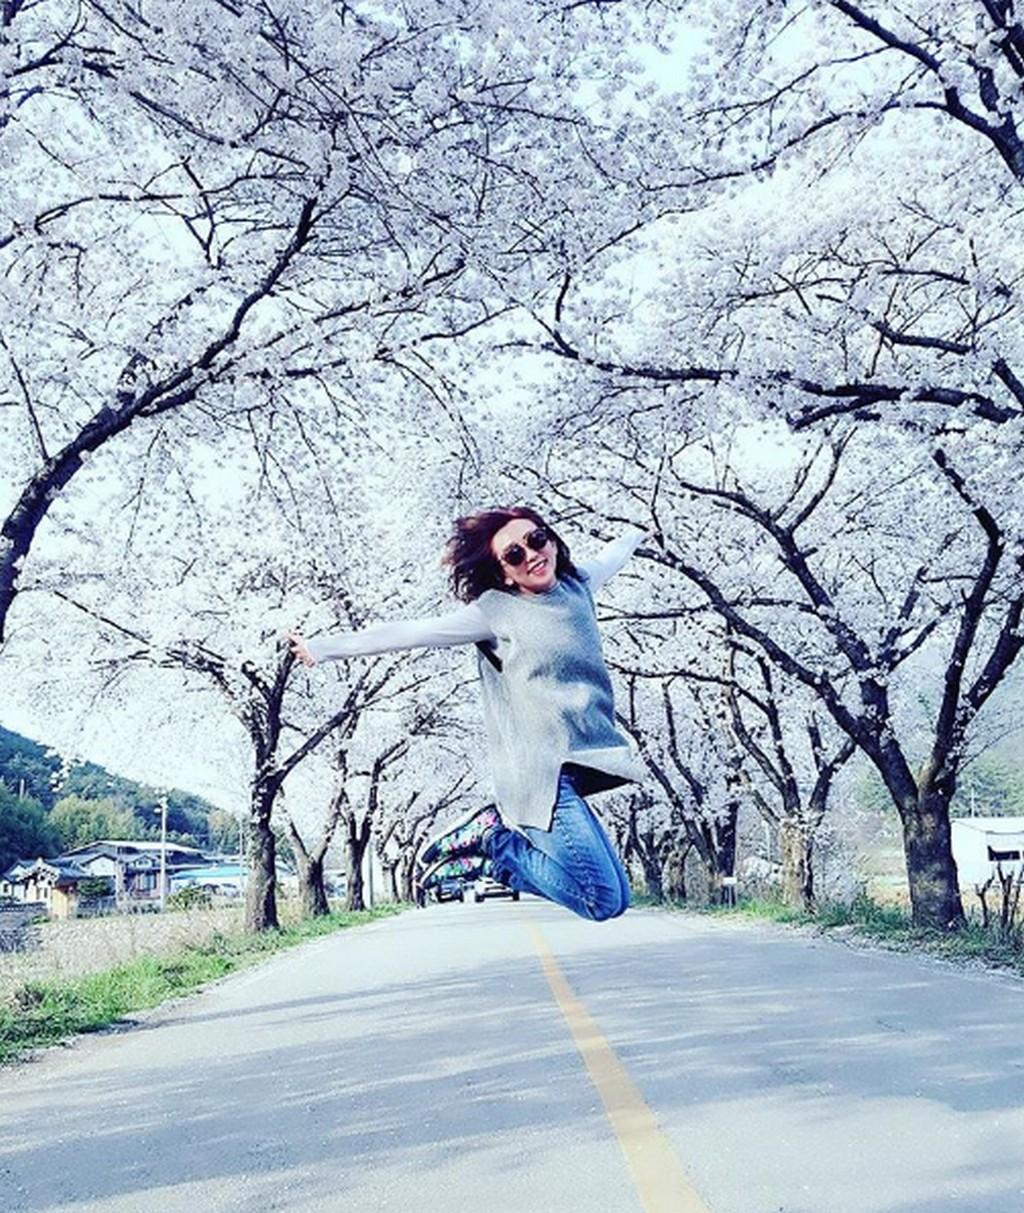 Gyeongju Cherry Blossom Festival, Busan